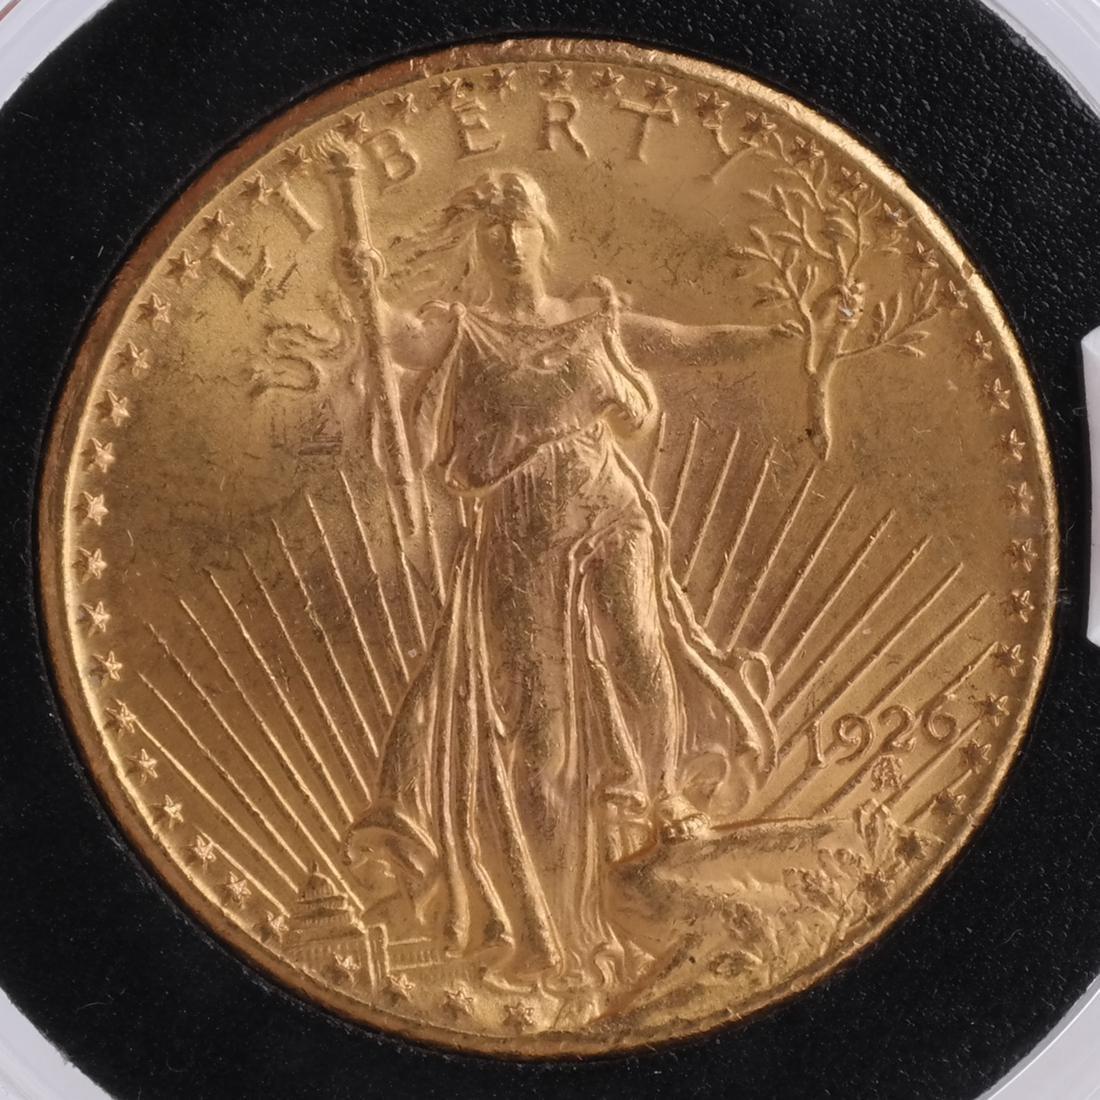 1926 $20 Gold Saint Gaudens, MS 65